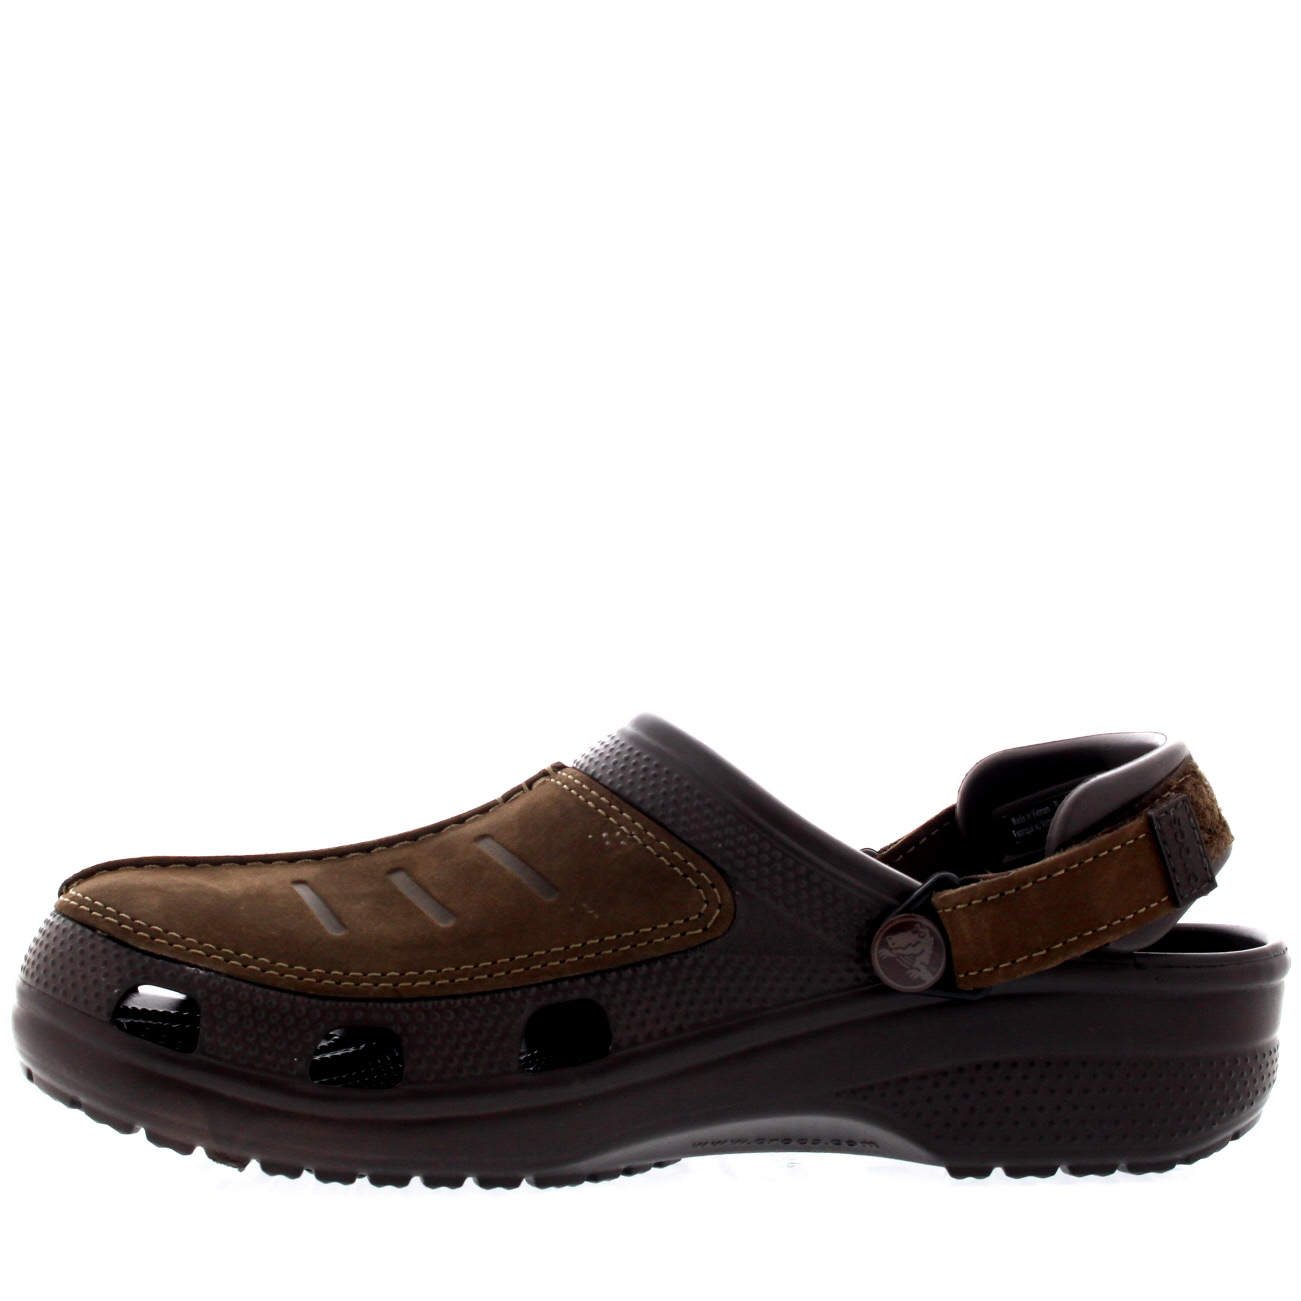 Mens Clog Type Shoes